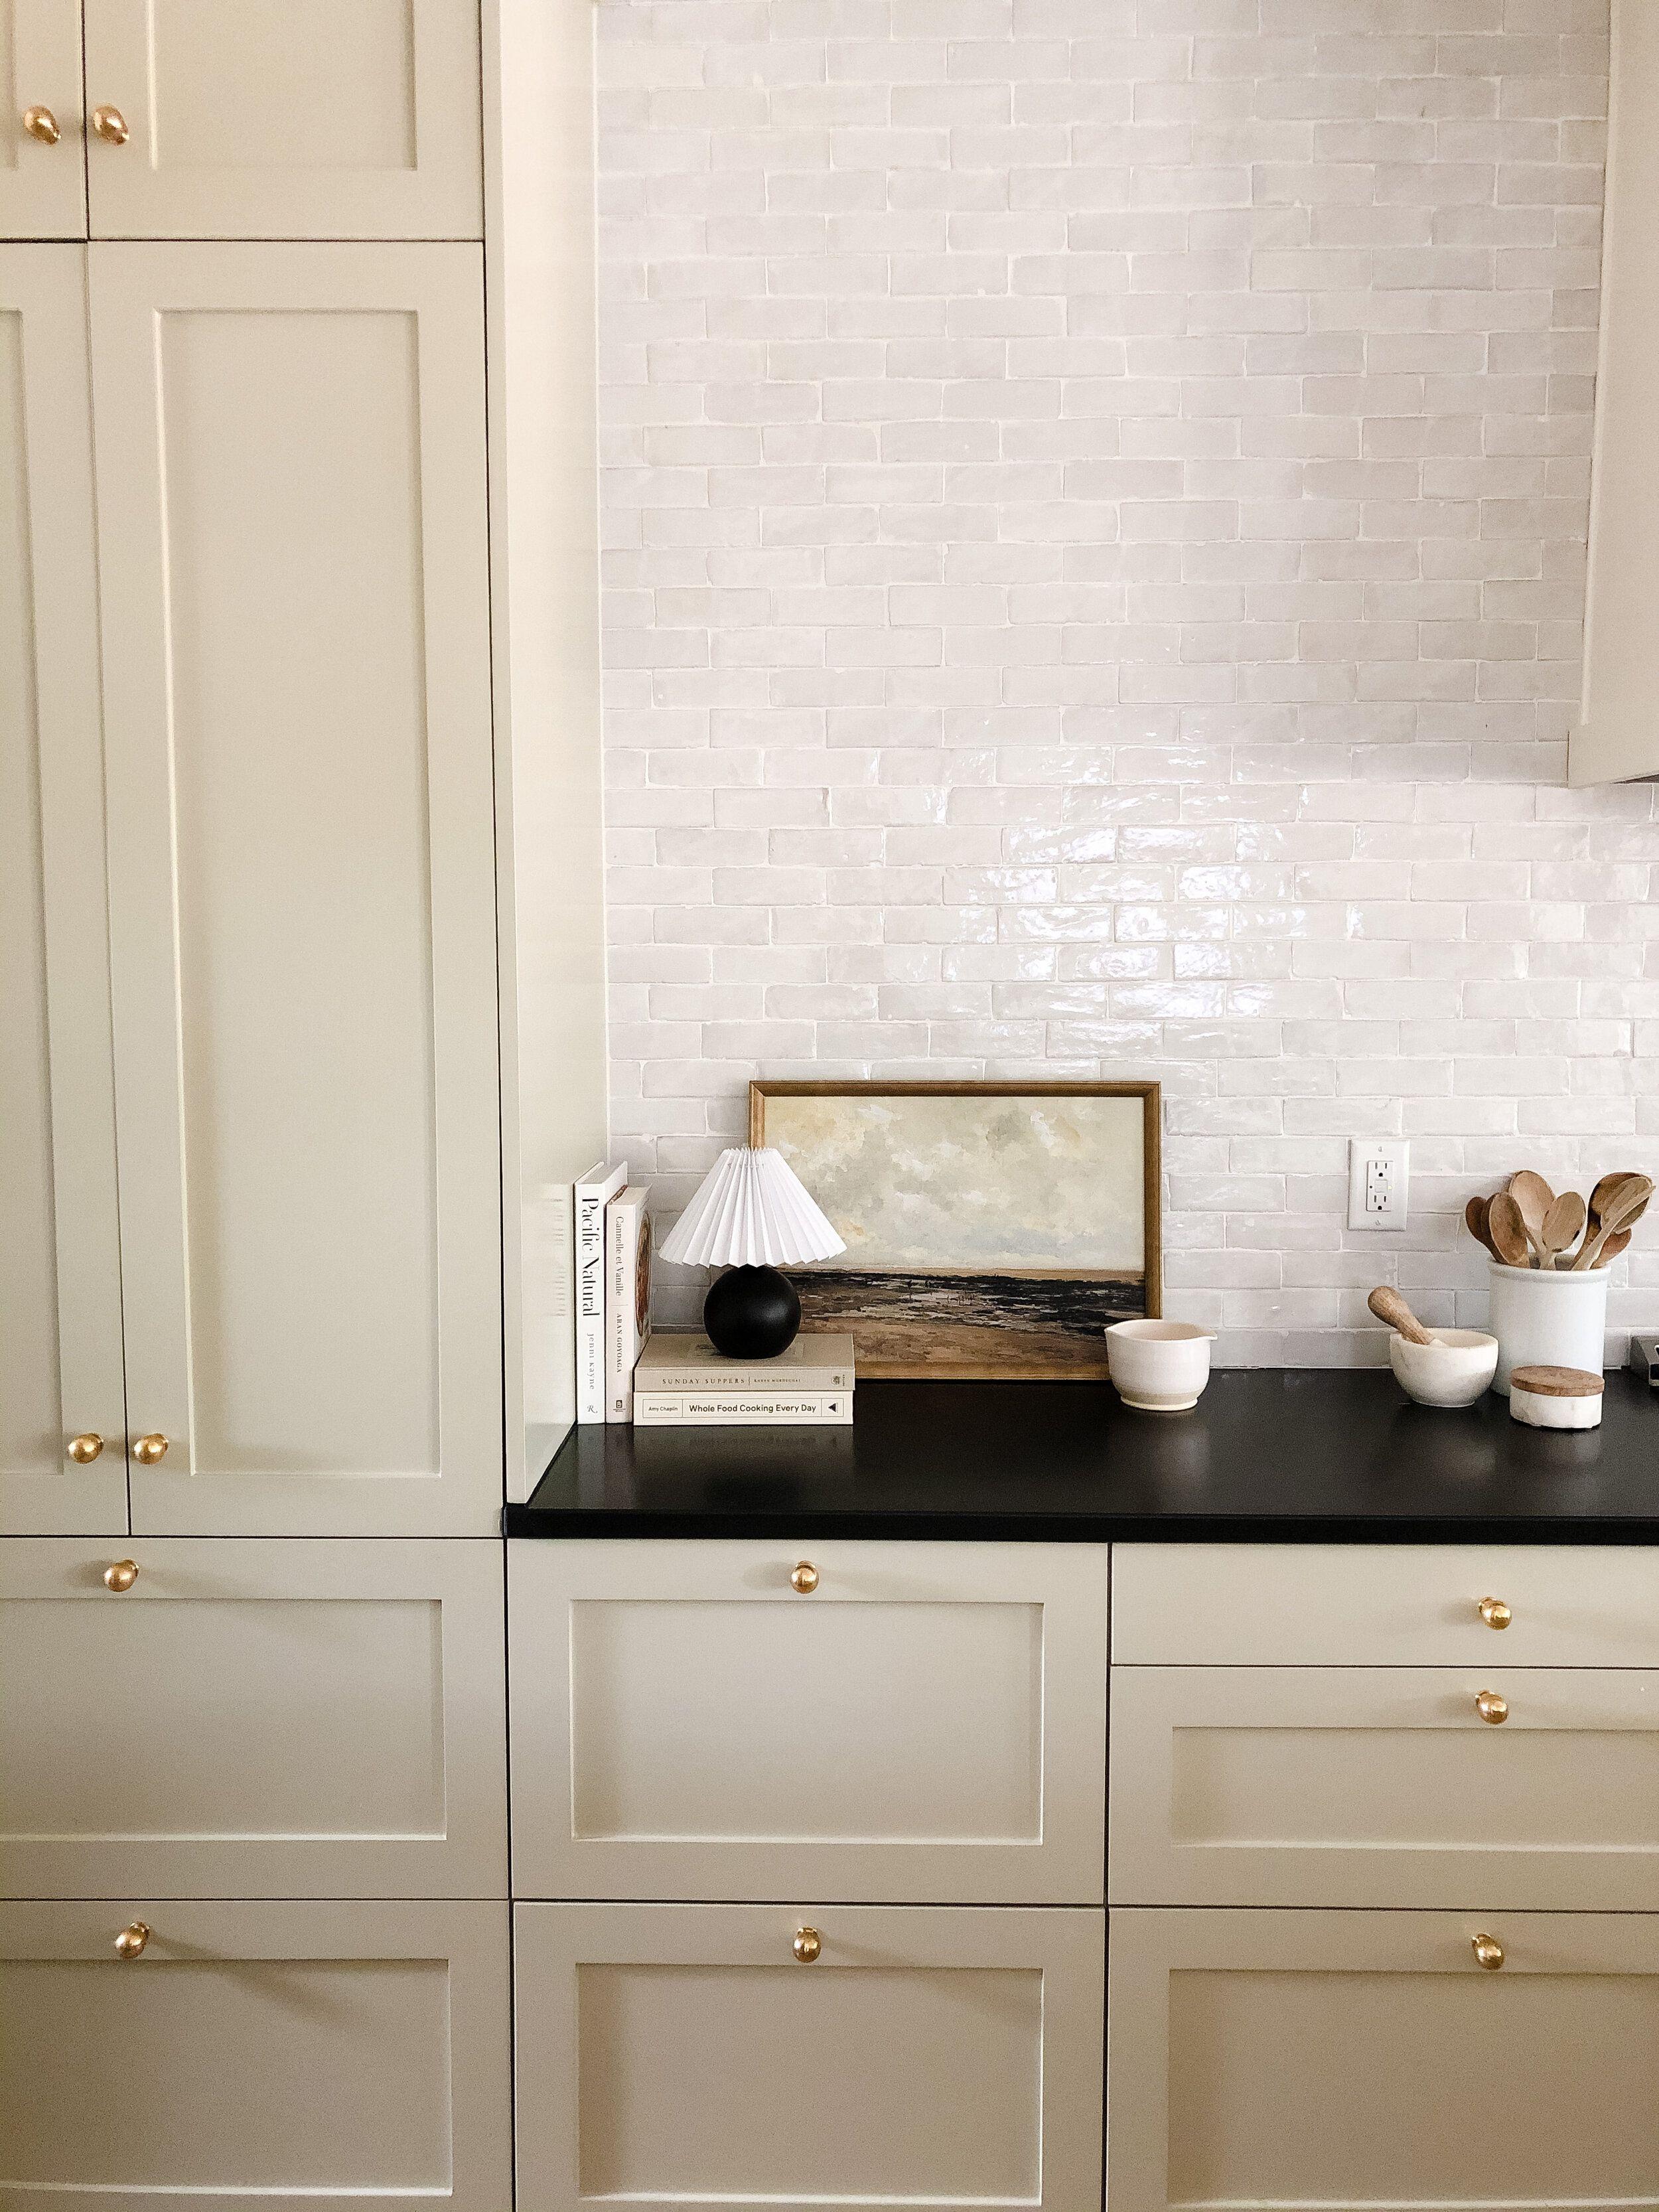 Five Things Friday Light Dwell Kitchen Lamps Petite Kitchen Kitchen Inspirations